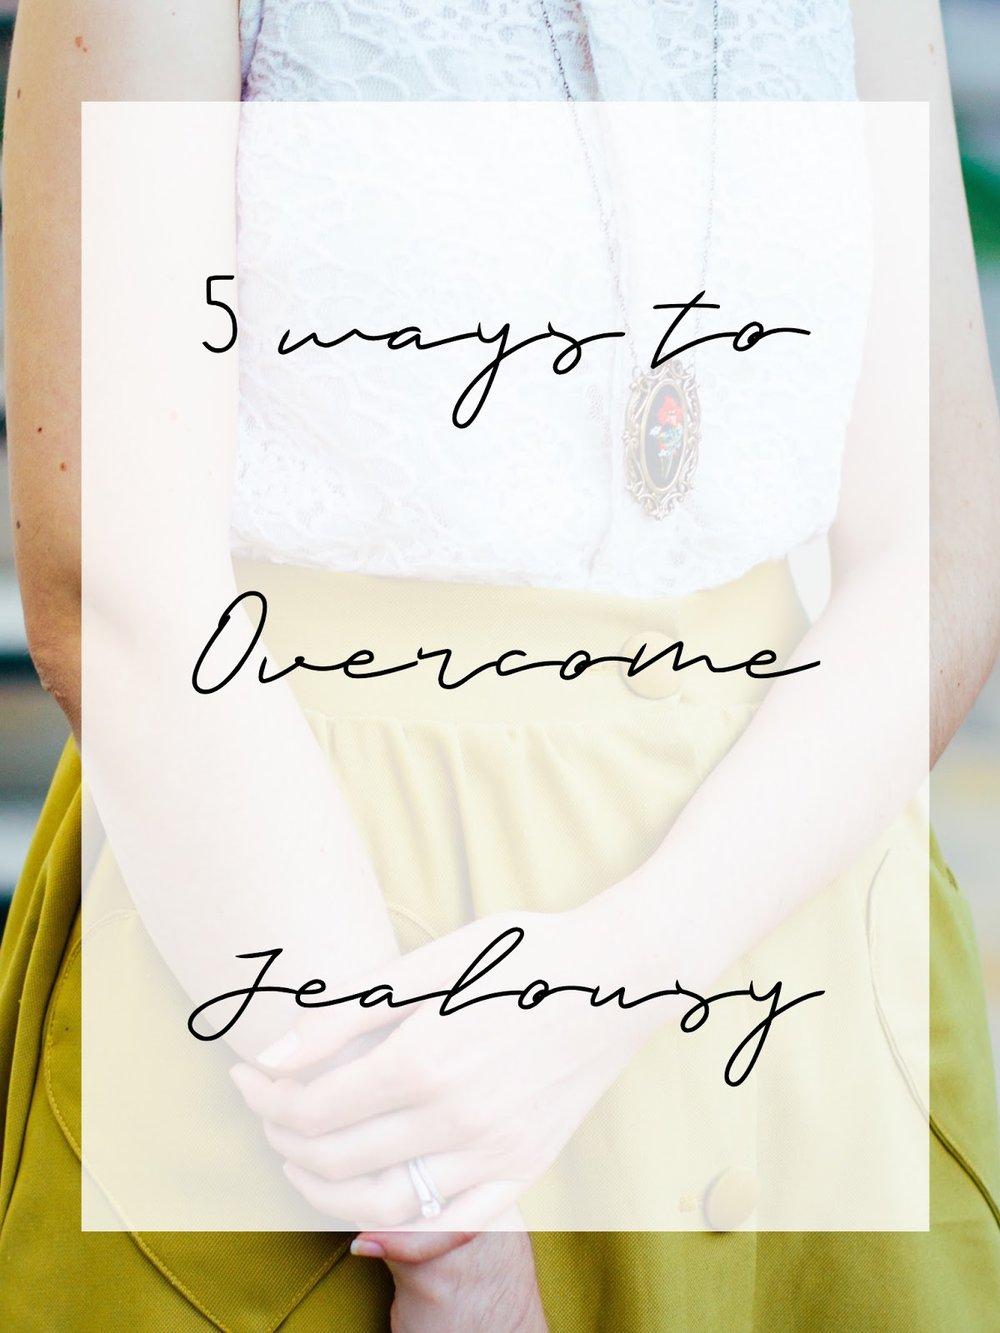 ways-to-overcome-jealousy-danamarie-kirkland.jpg